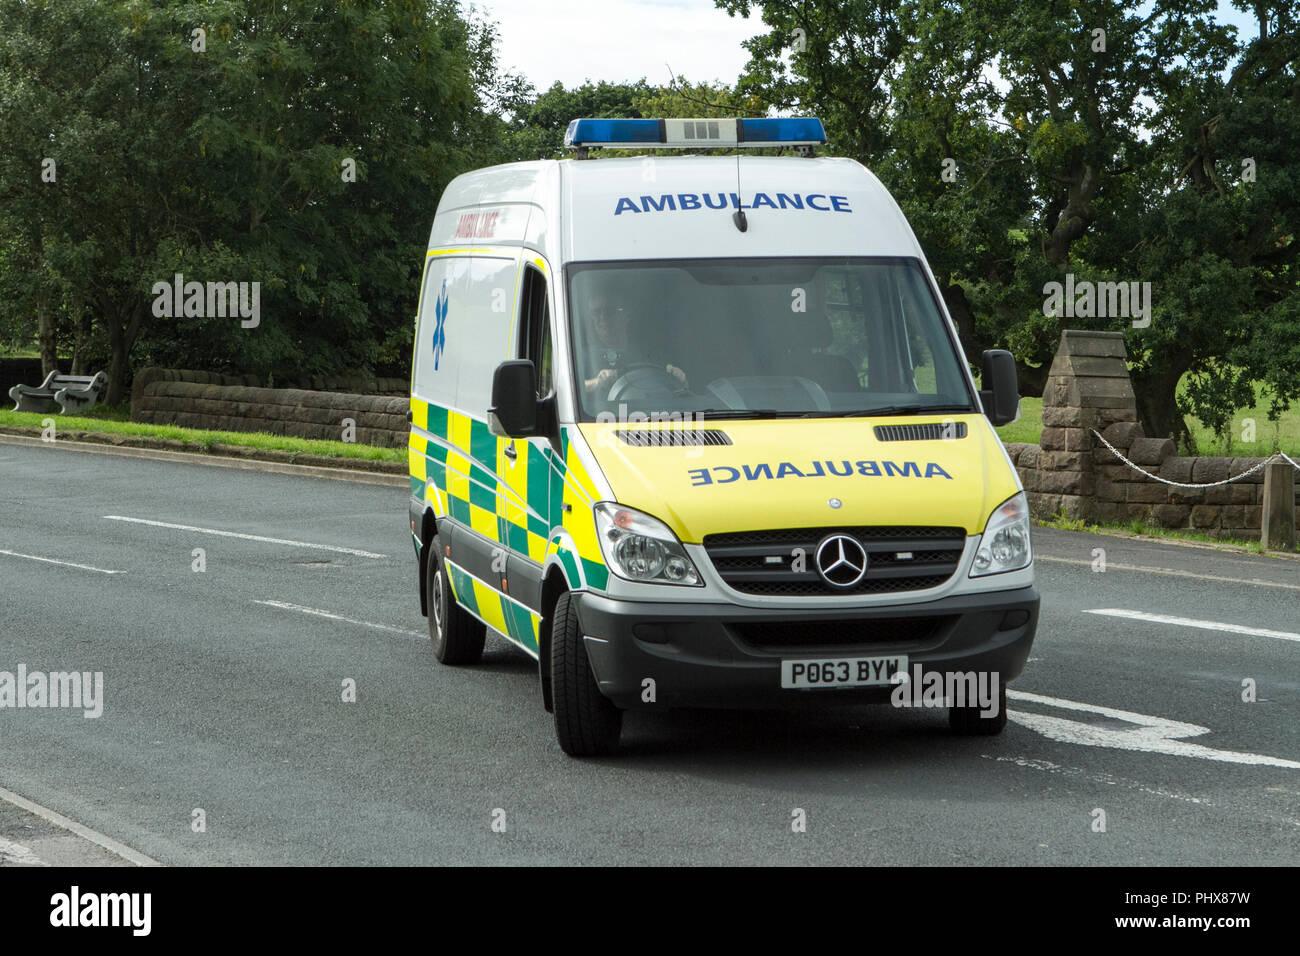 emergency ambulance paramedic urgent aid medic medical urgency assist first aid doctor rescue mercedes sprinter van - Stock Image